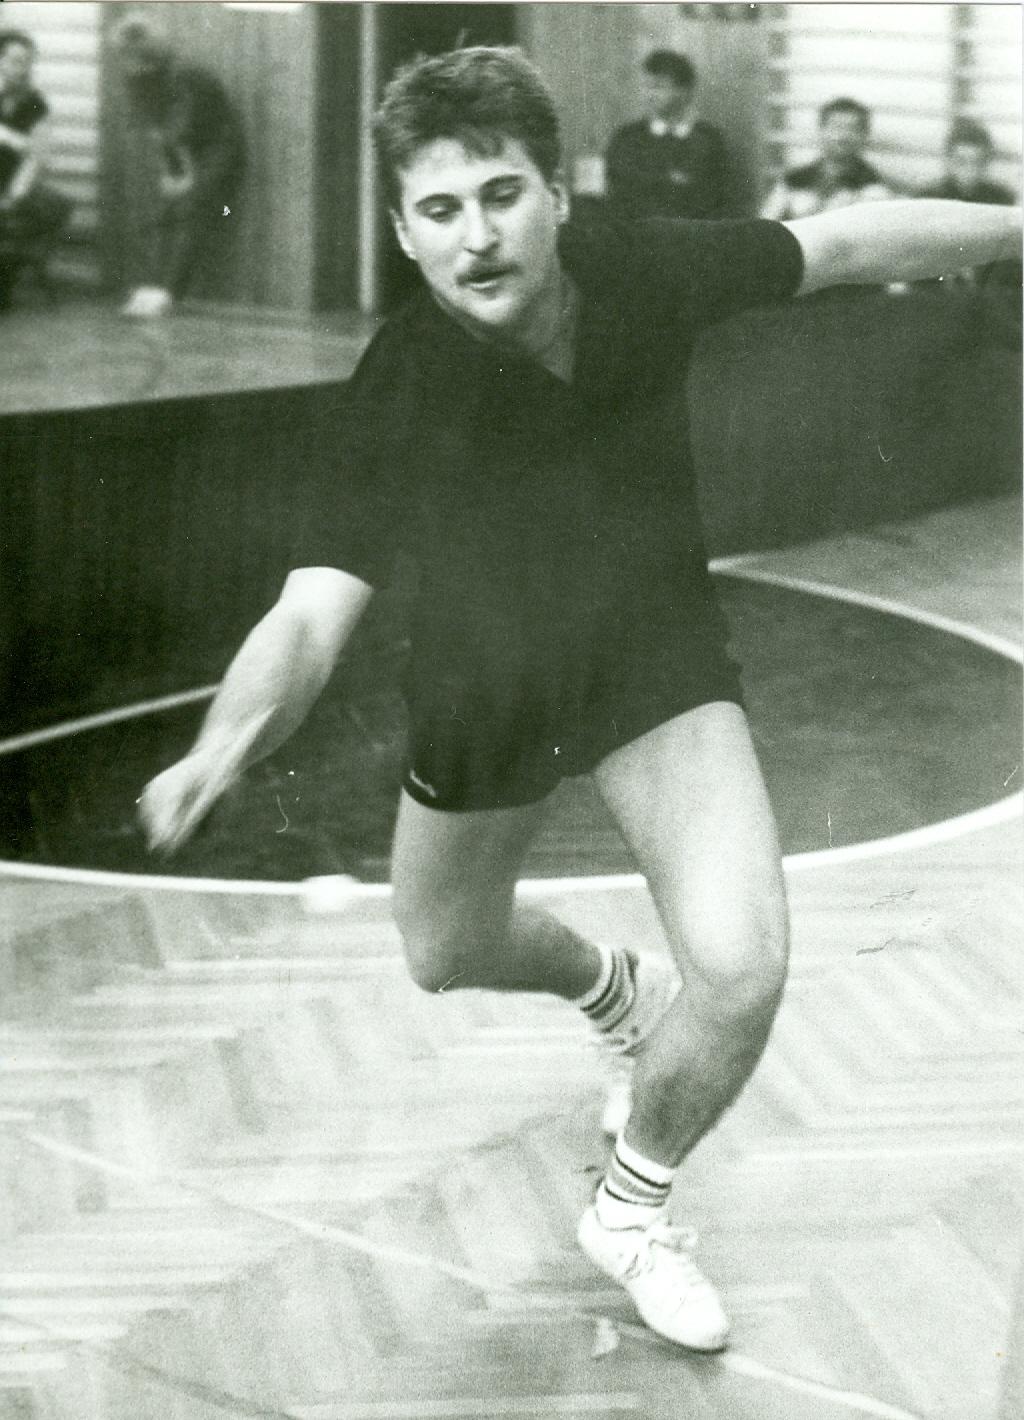 Skumáth István